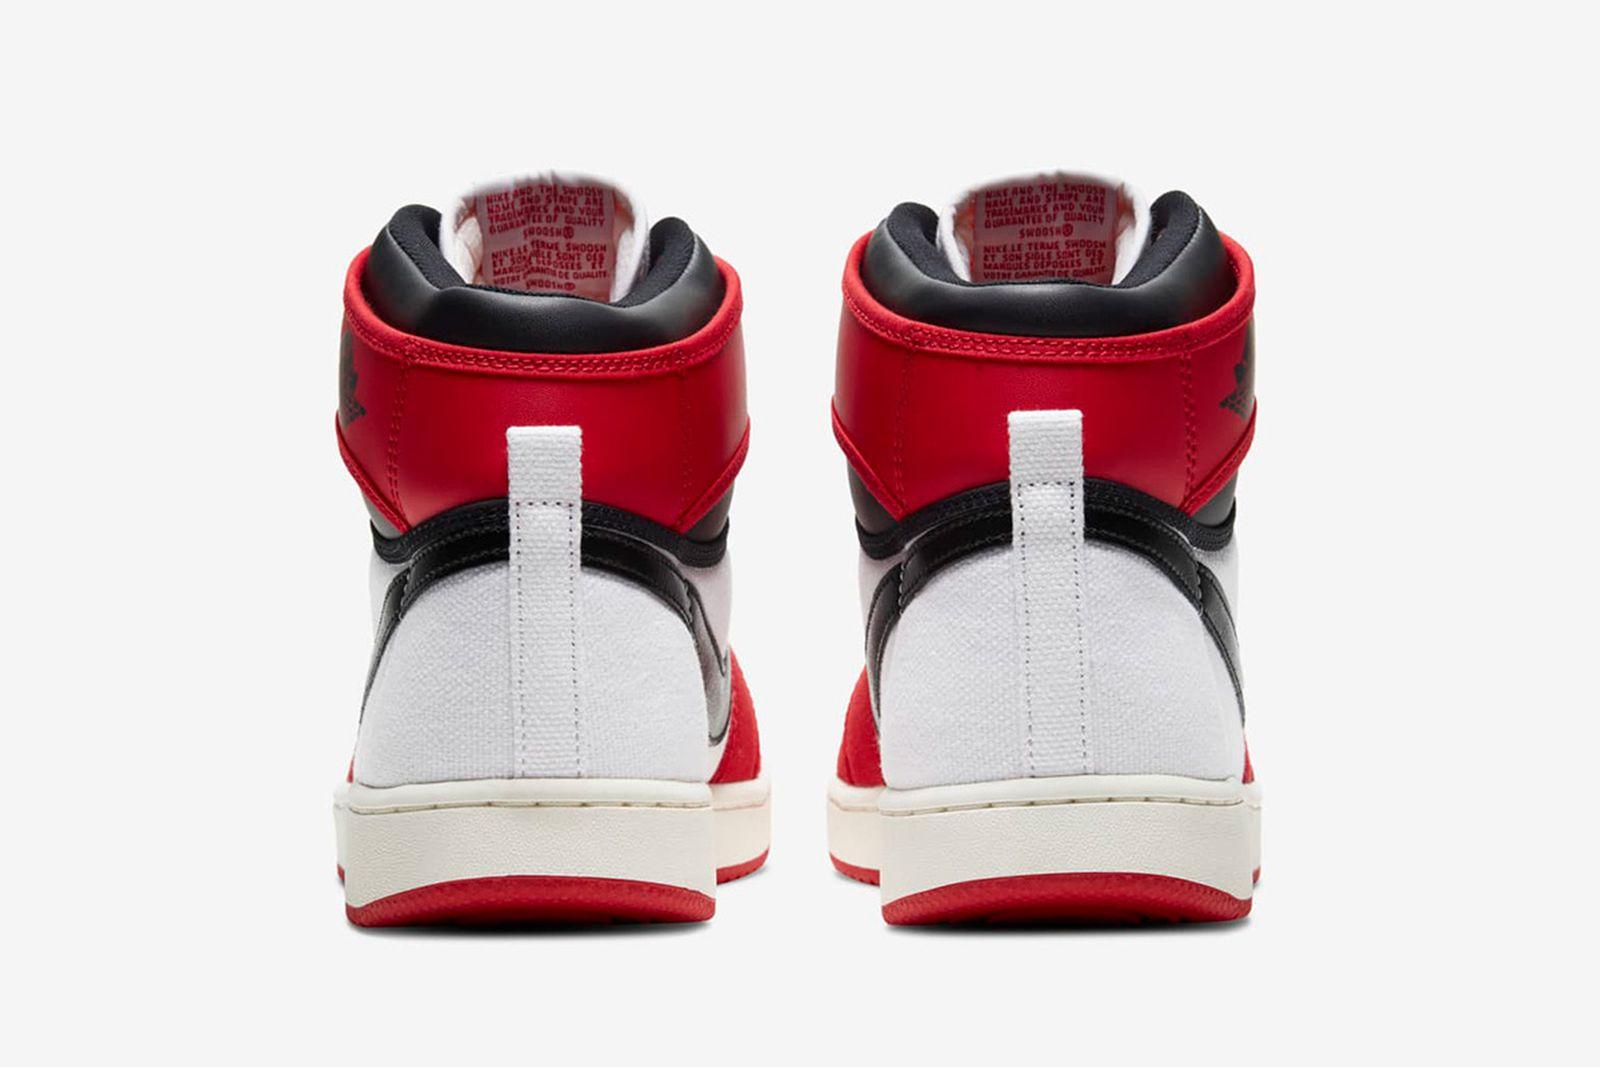 nike-air-jordan-1-ko-chicago-2021-release-date-price-02